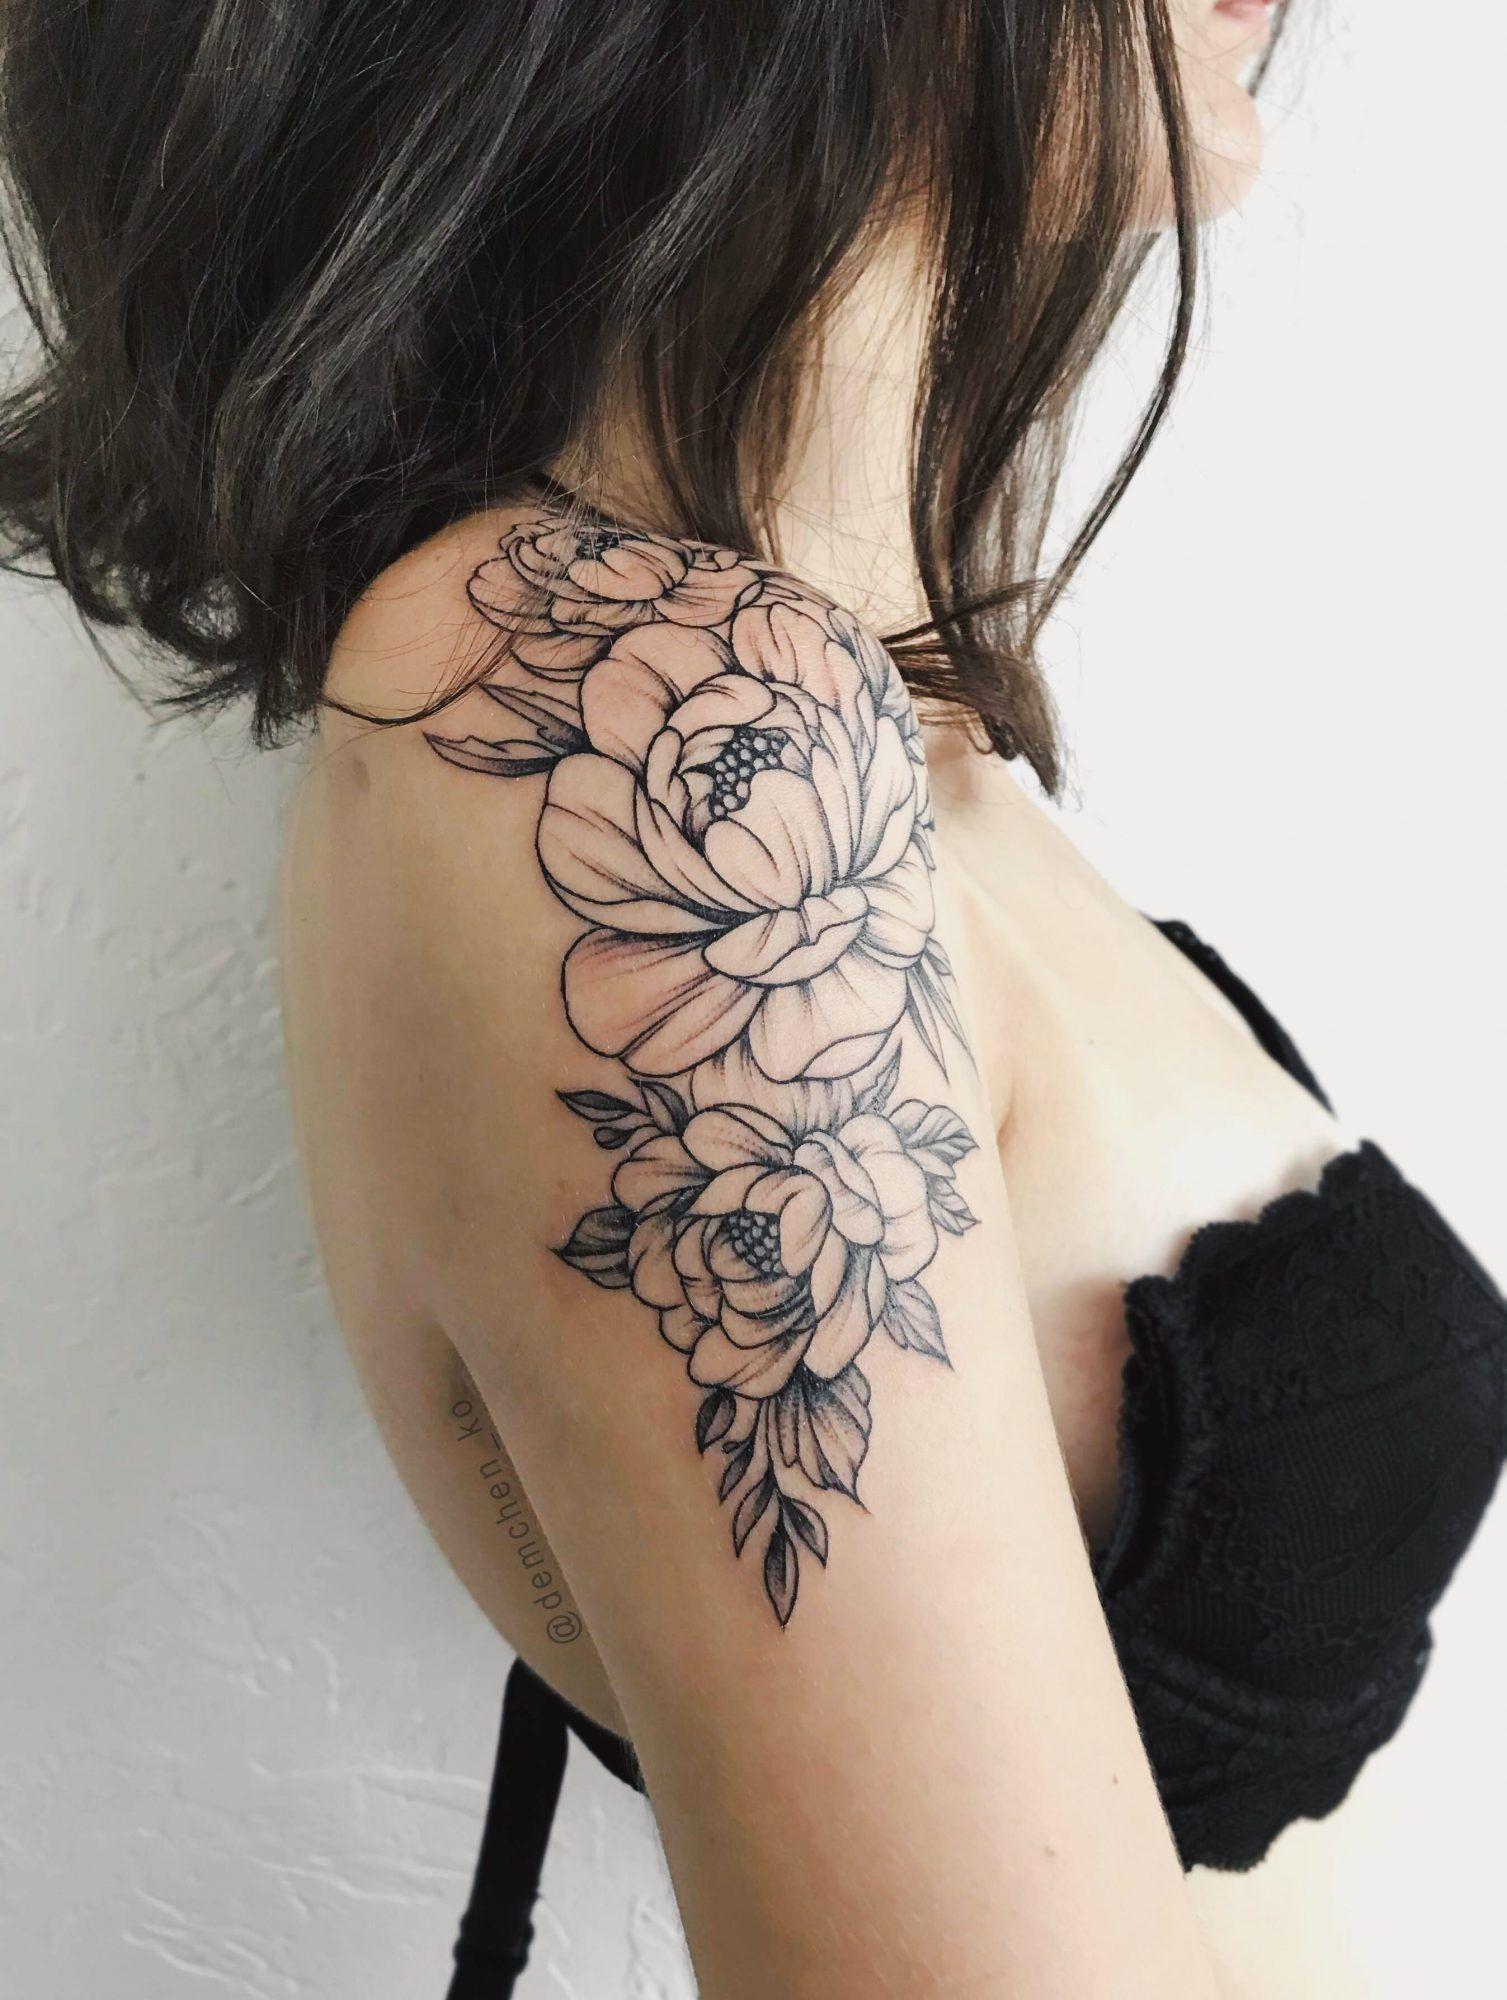 Upper Arm Tattoo Designs For Women